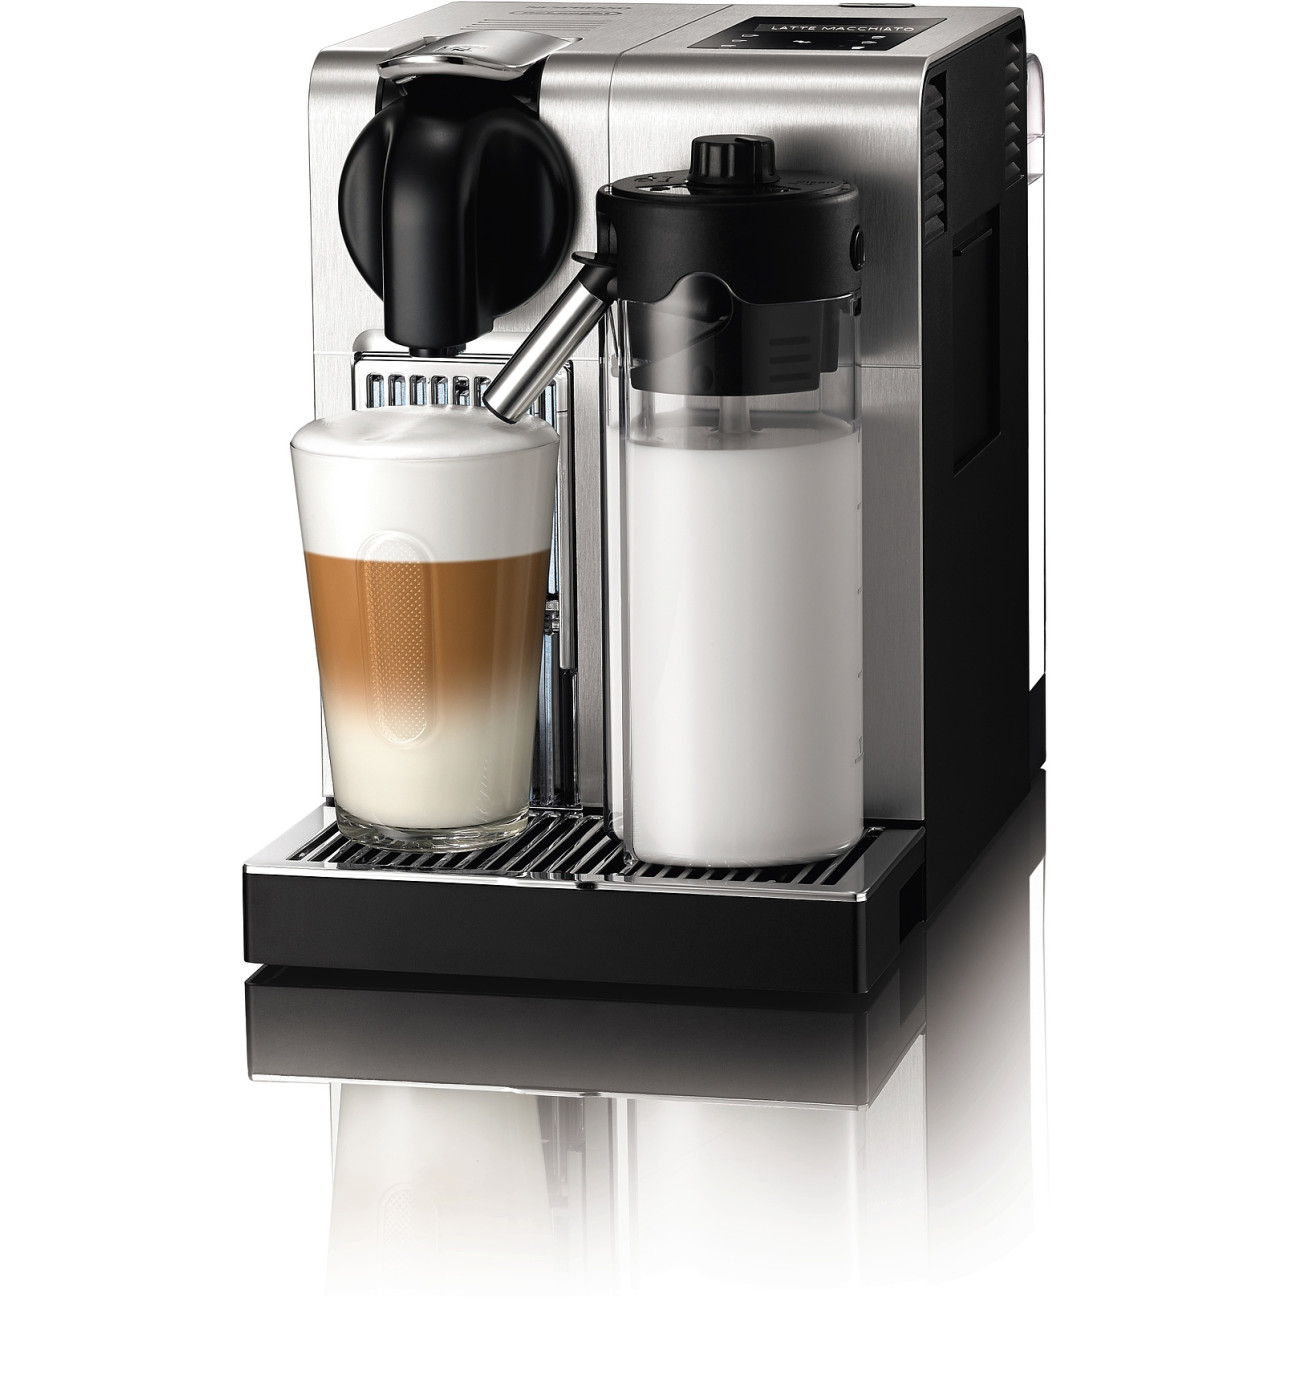 Electronic David Jones Coffee Machines nespresso coffee machines david jones en750mb lattissima pro machine metal